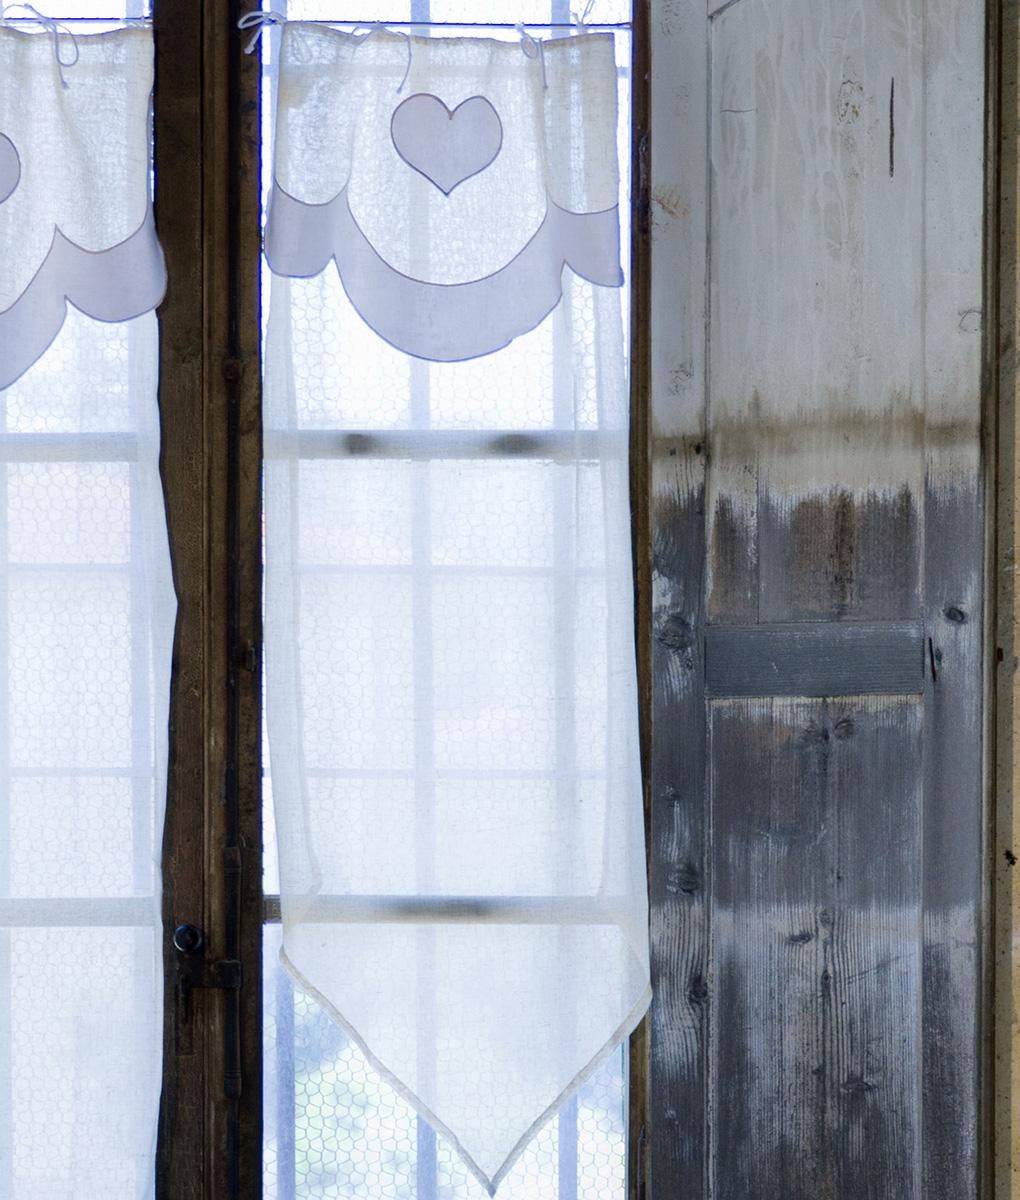 Tenda finestra con mantovana e bordo a punta 45x60 cm - Tenda finestra bagno ...